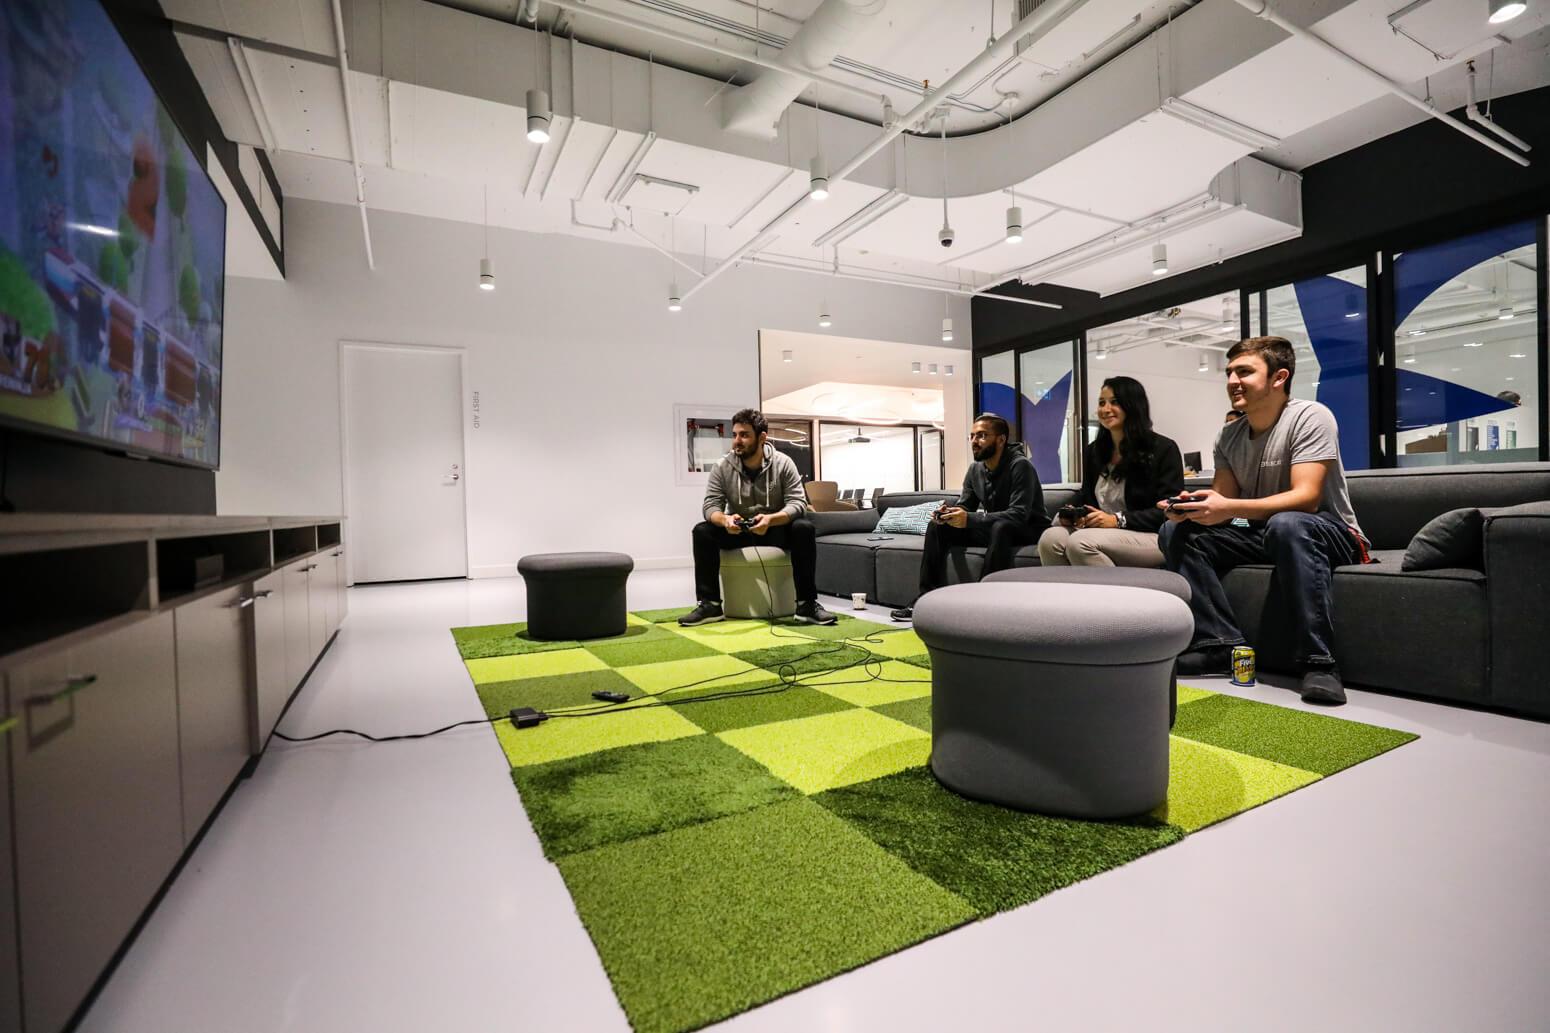 BlueCat-Toronto-KillerSpaces-Techvibes-11